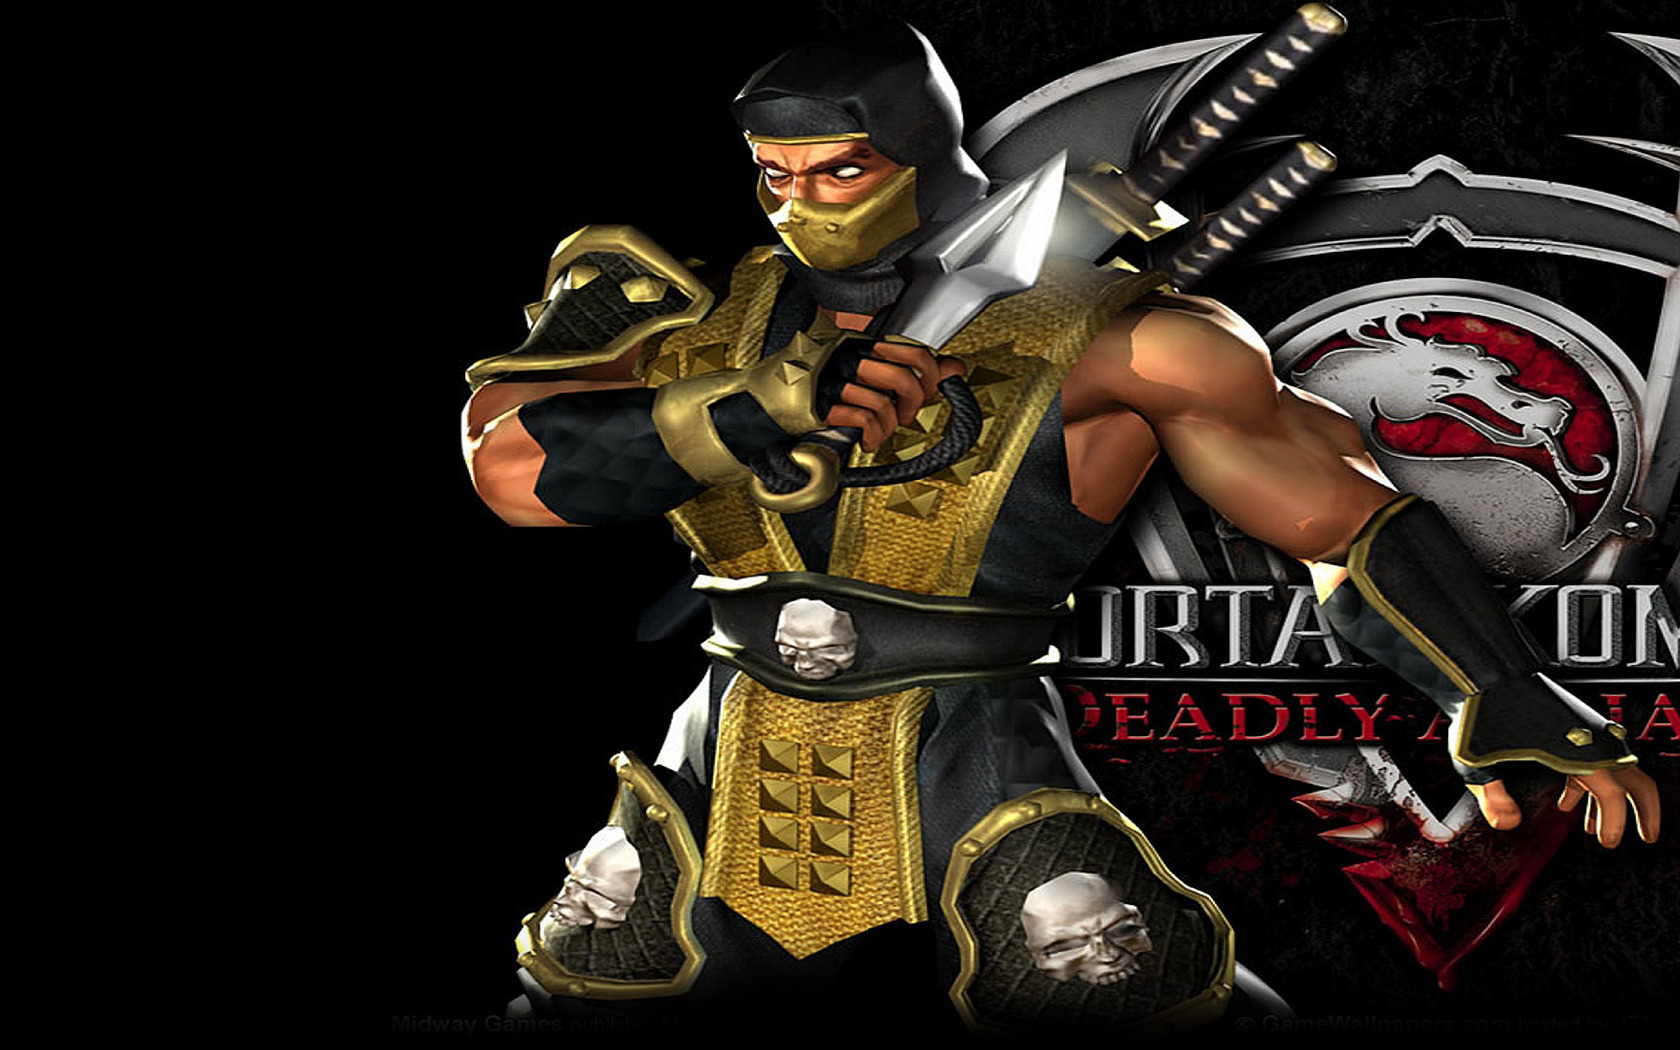 Scorpion   Mortal Kombat   Deadly Alliance wallpaper 12325 1680x1050